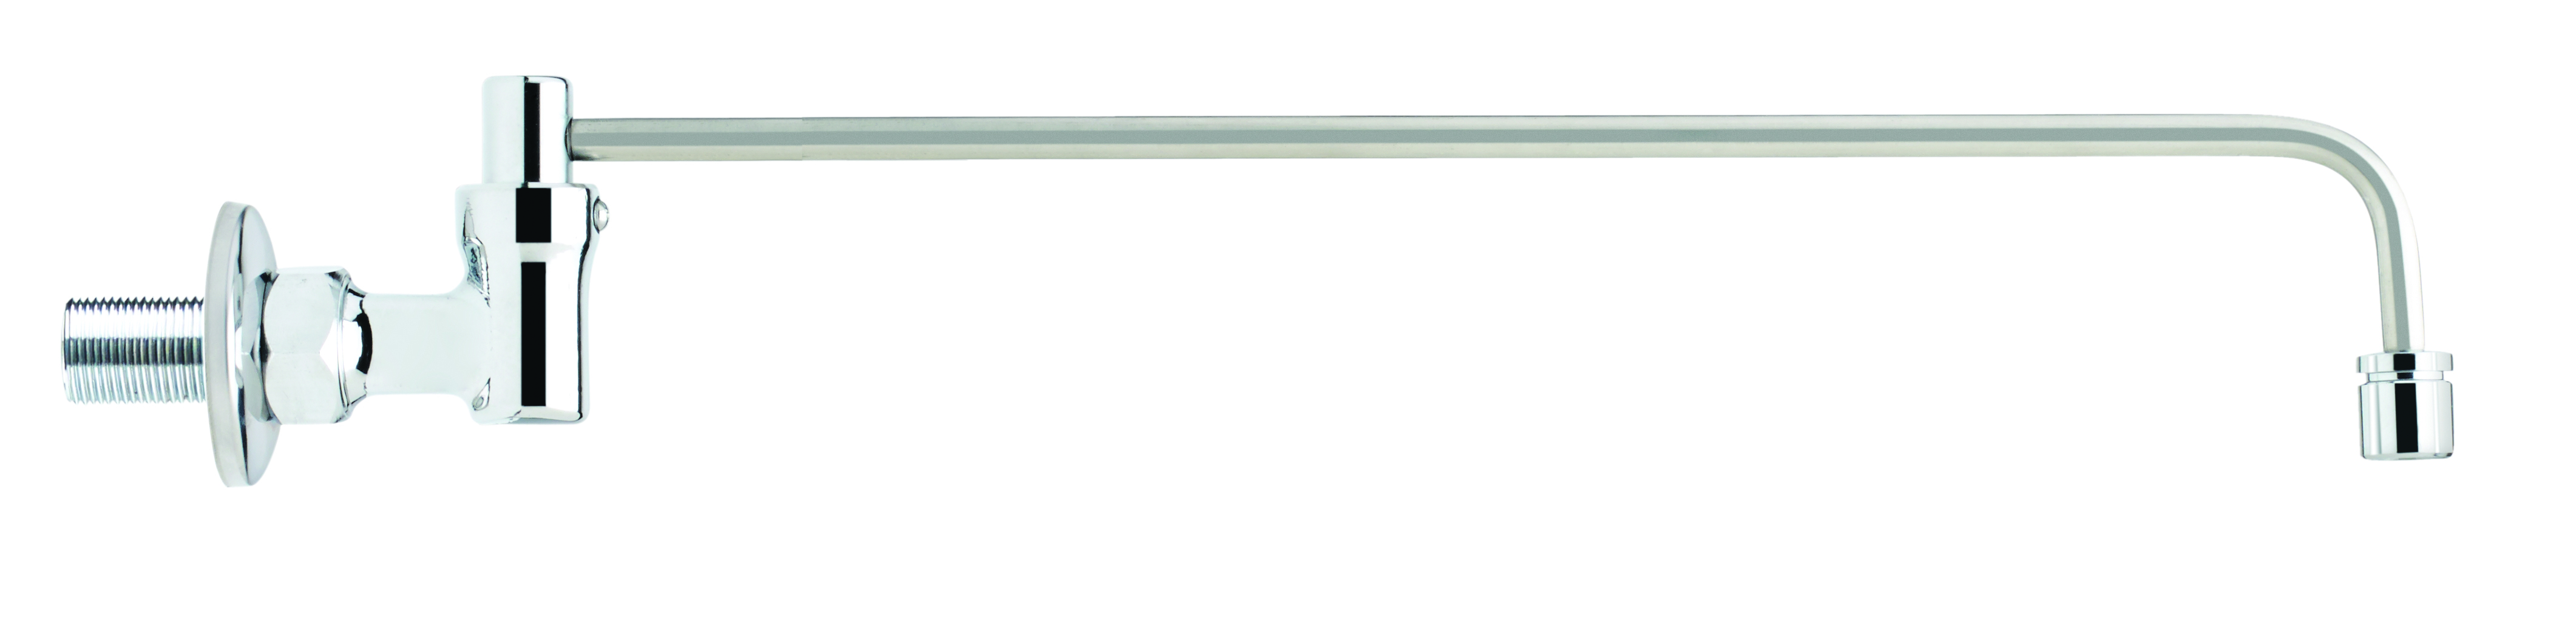 Krowne Metal 13-223L faucet, wok / range filler